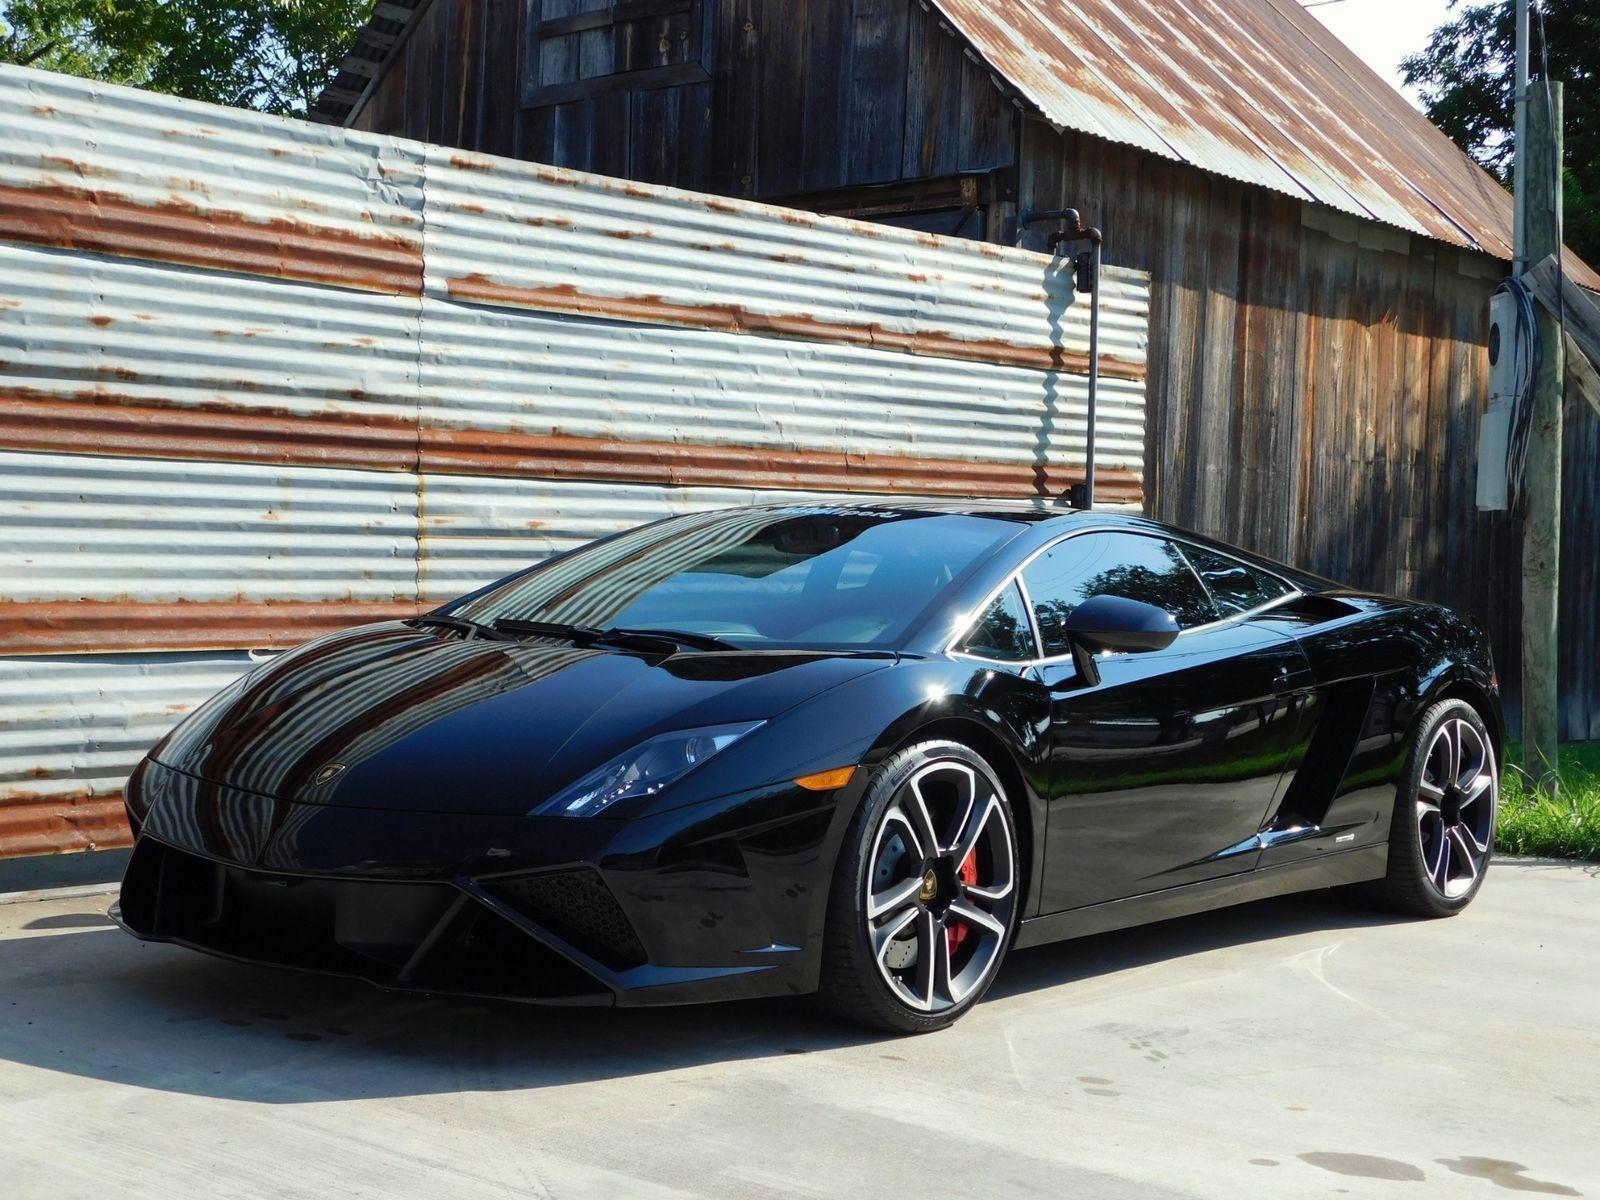 Gallardo Lp560 4 2014 Lamborghini Gallardo Bianco Canopus With 7233